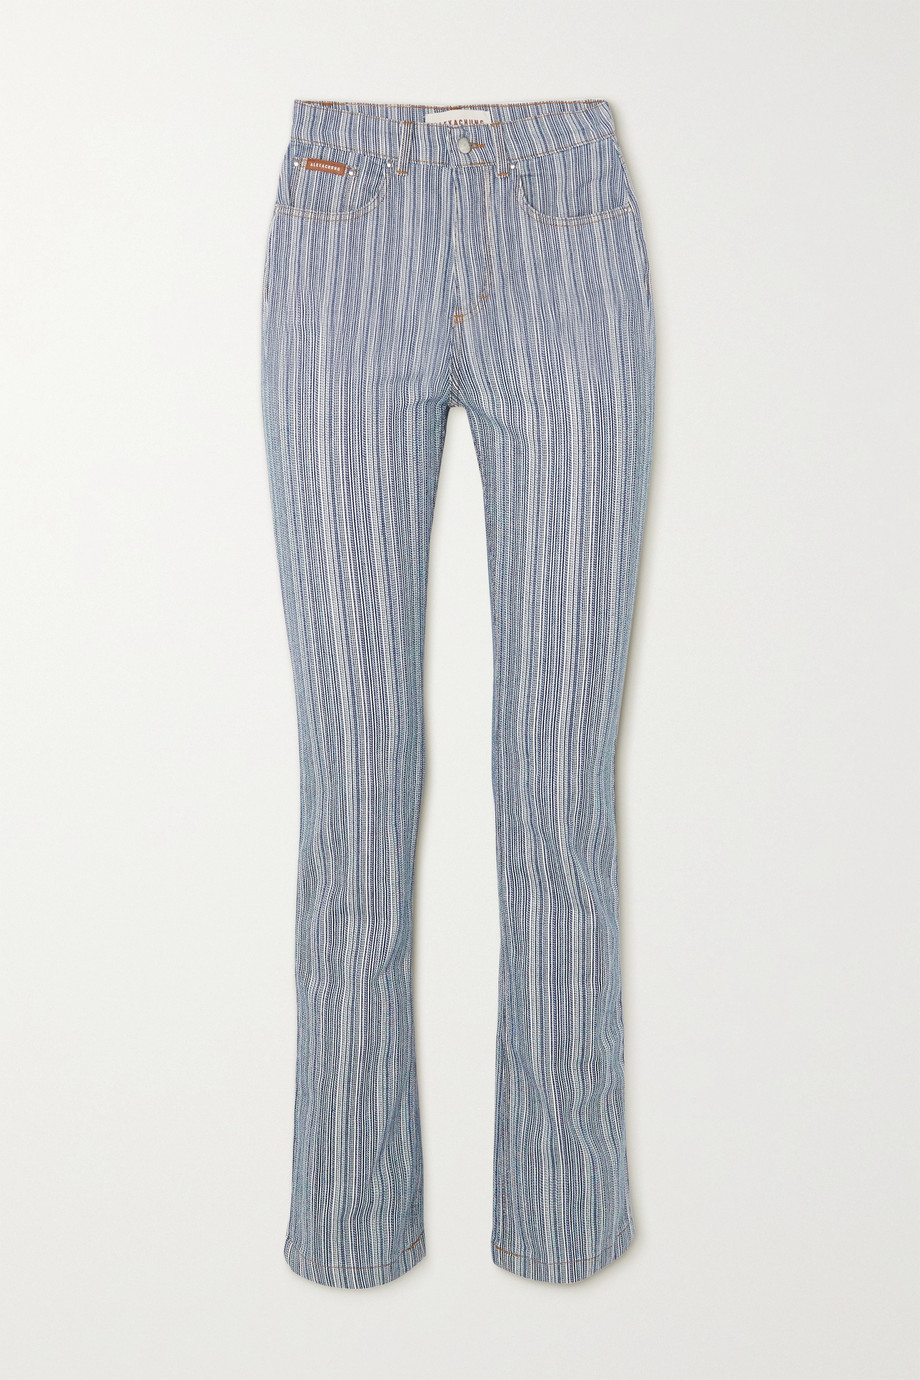 ALEXACHUNG Grady pinstriped flared jeans